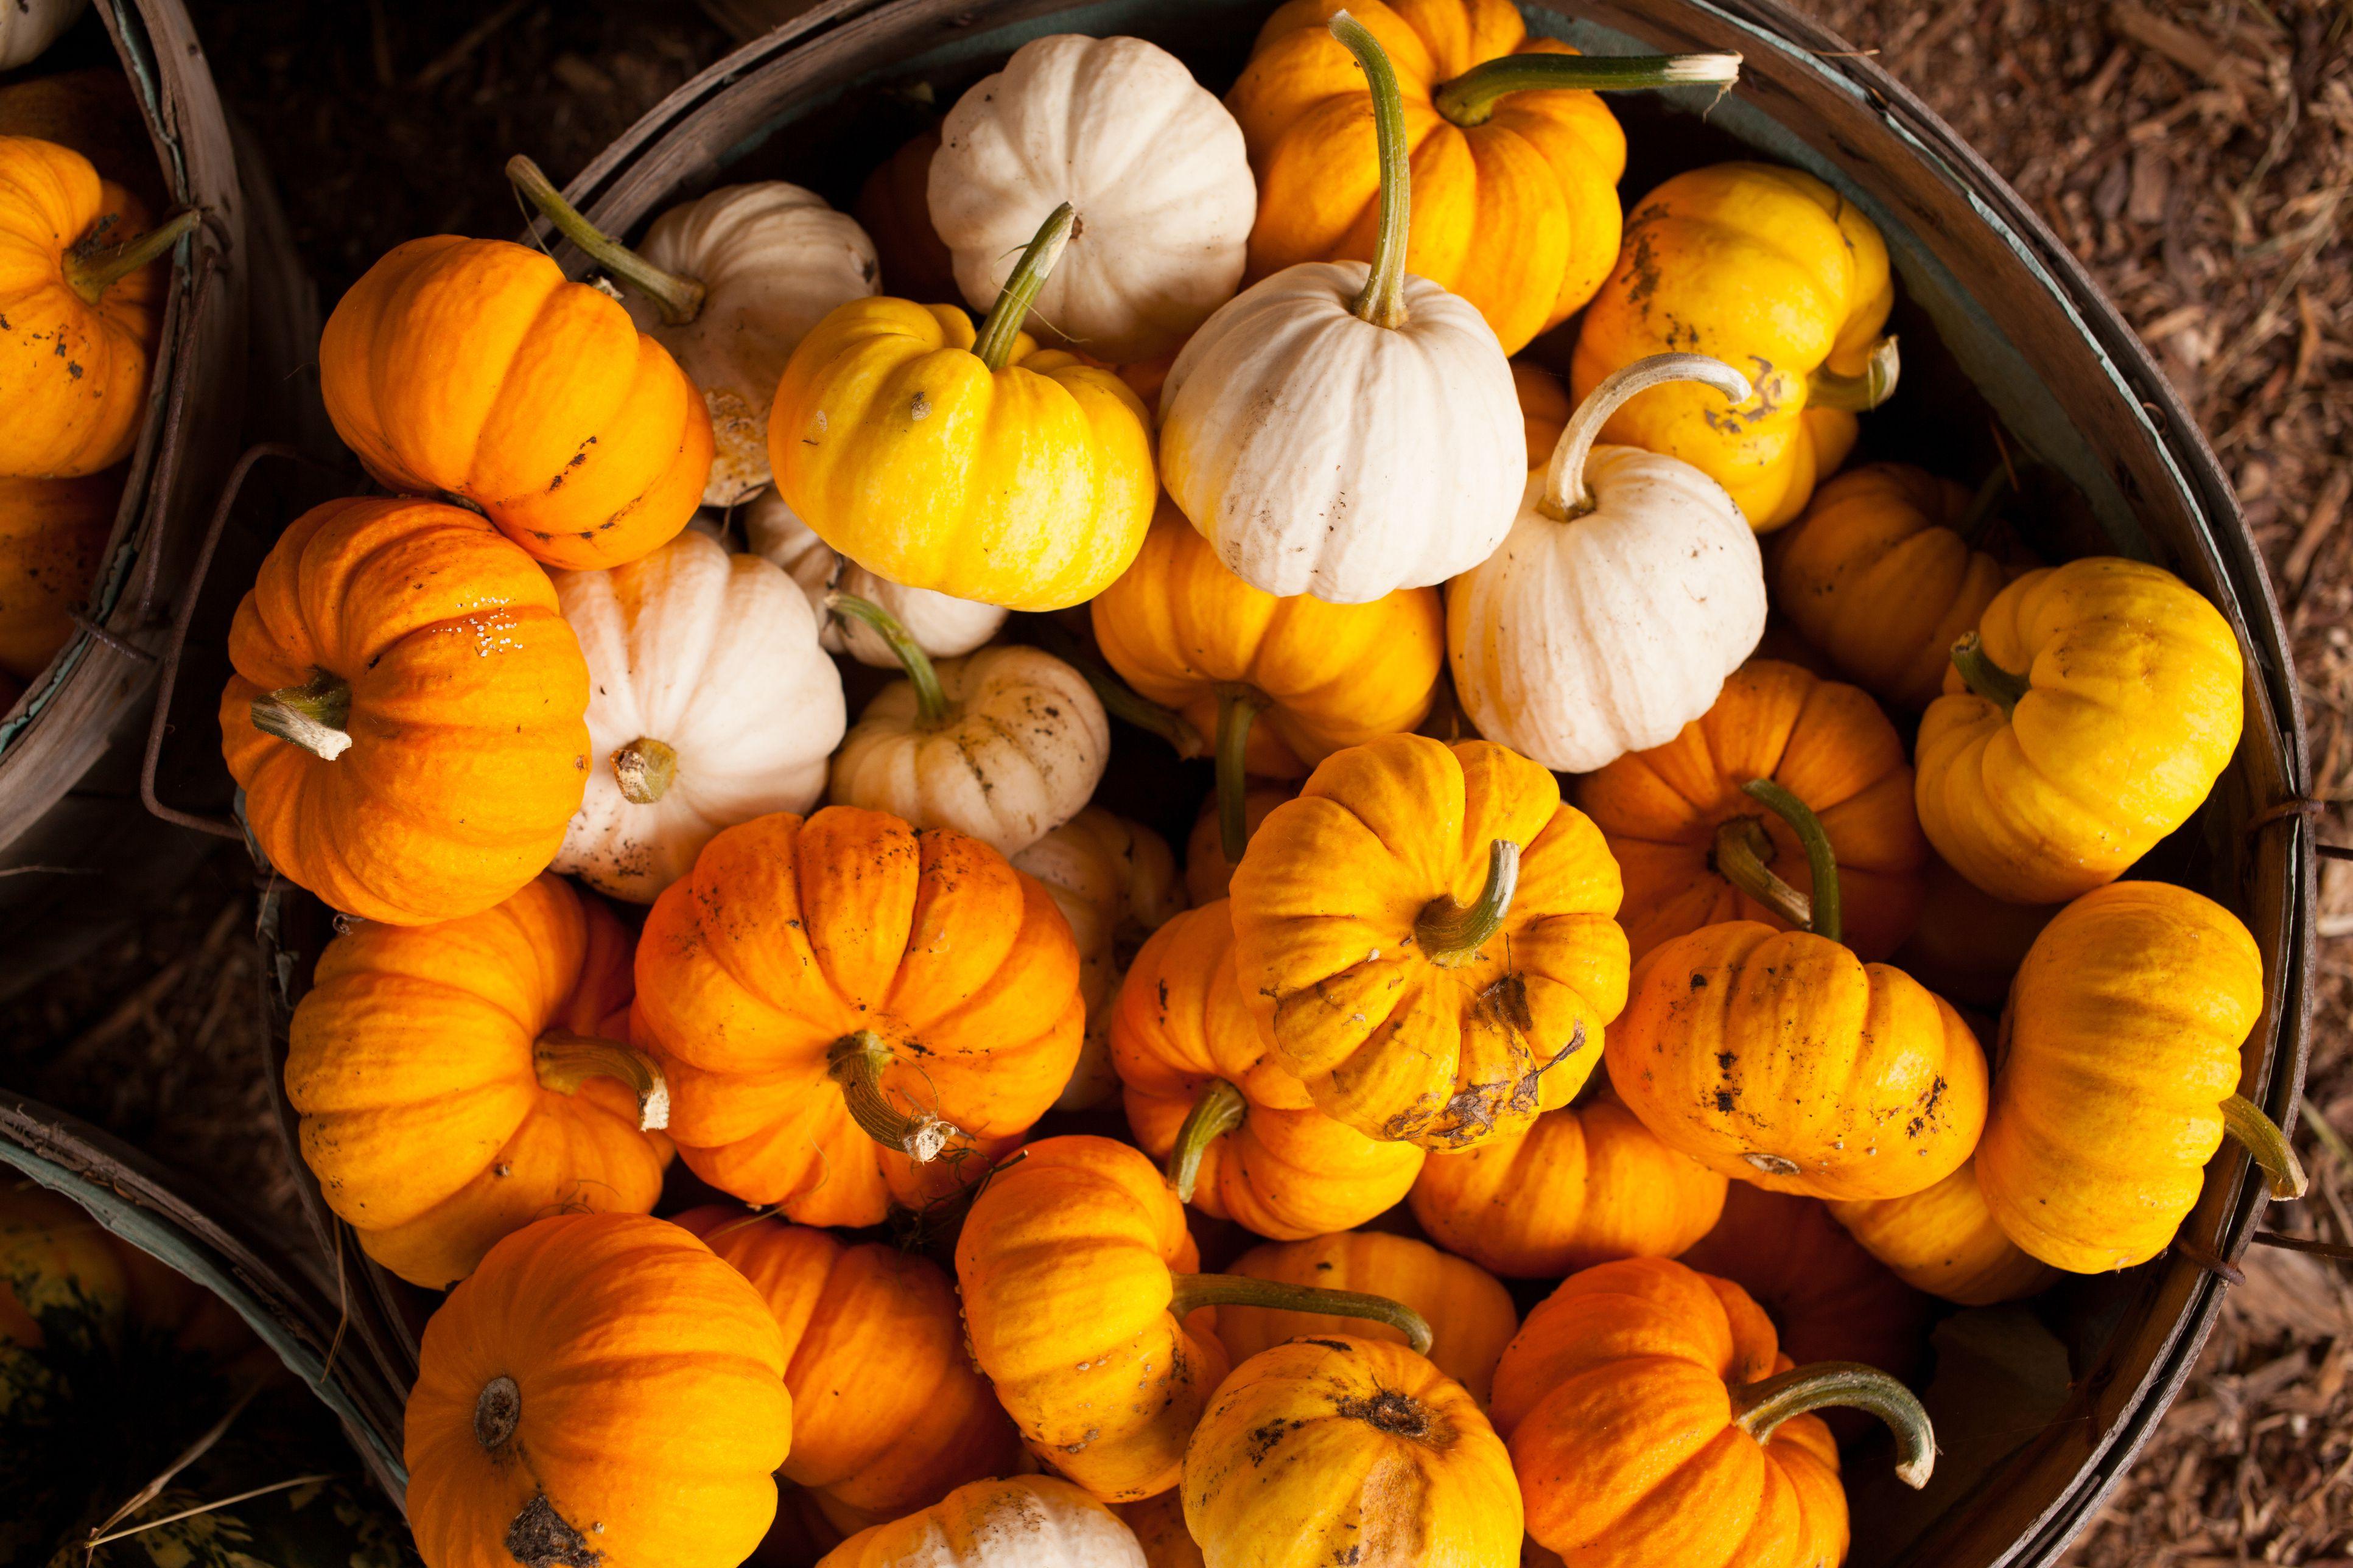 bucket full of miniature pumpkins